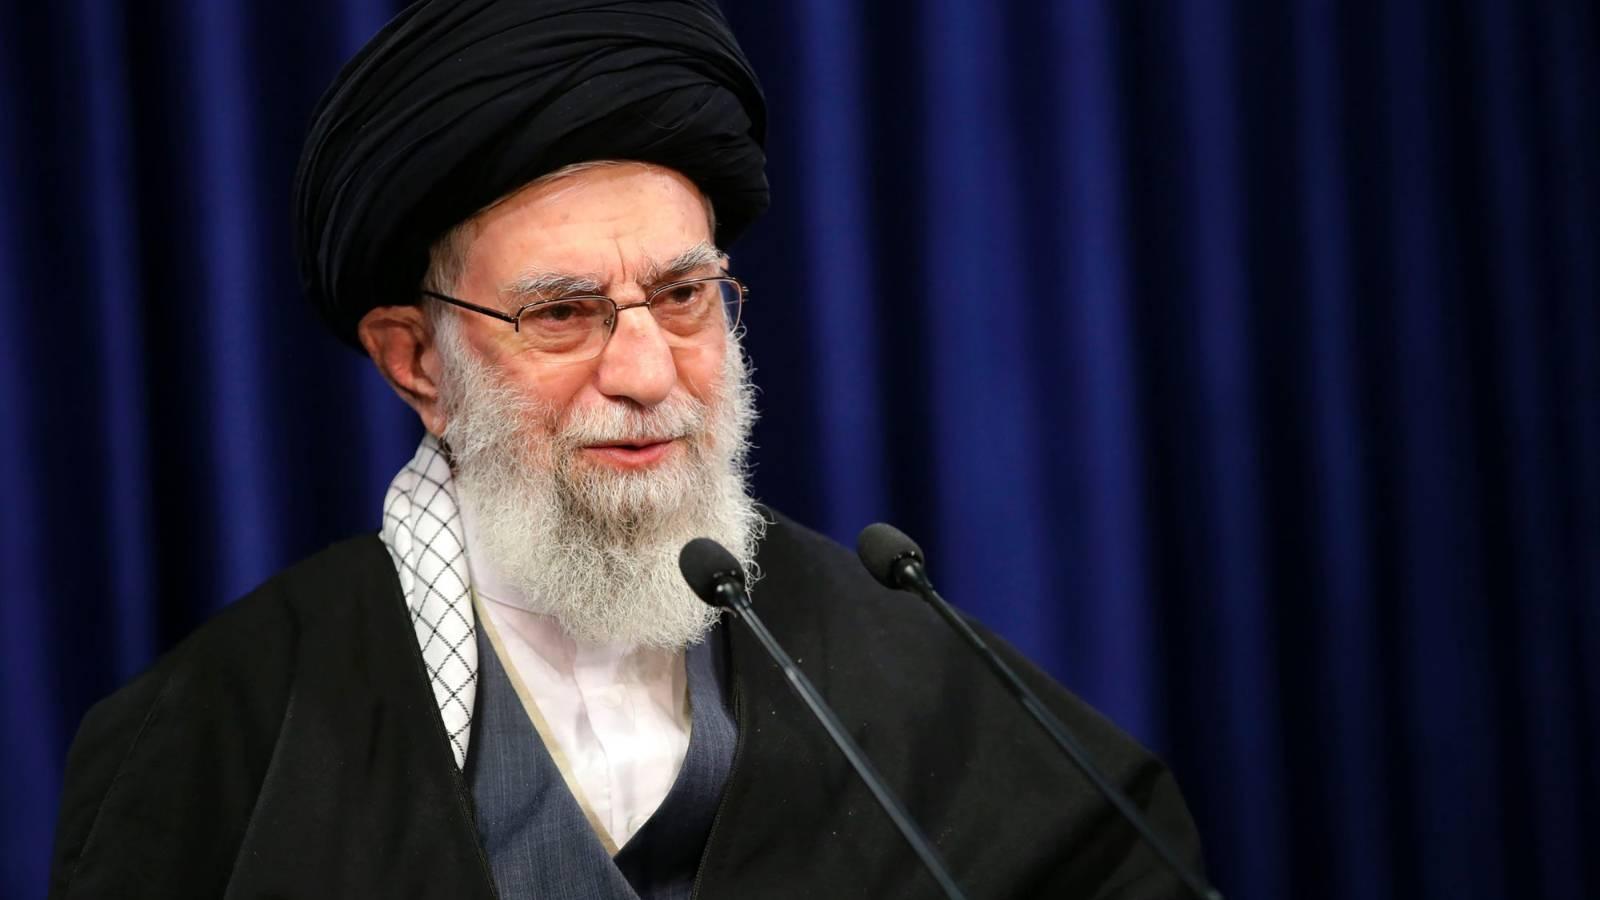 'Revenge is certain': Twitter suspends Iran leader's account over Trump threat